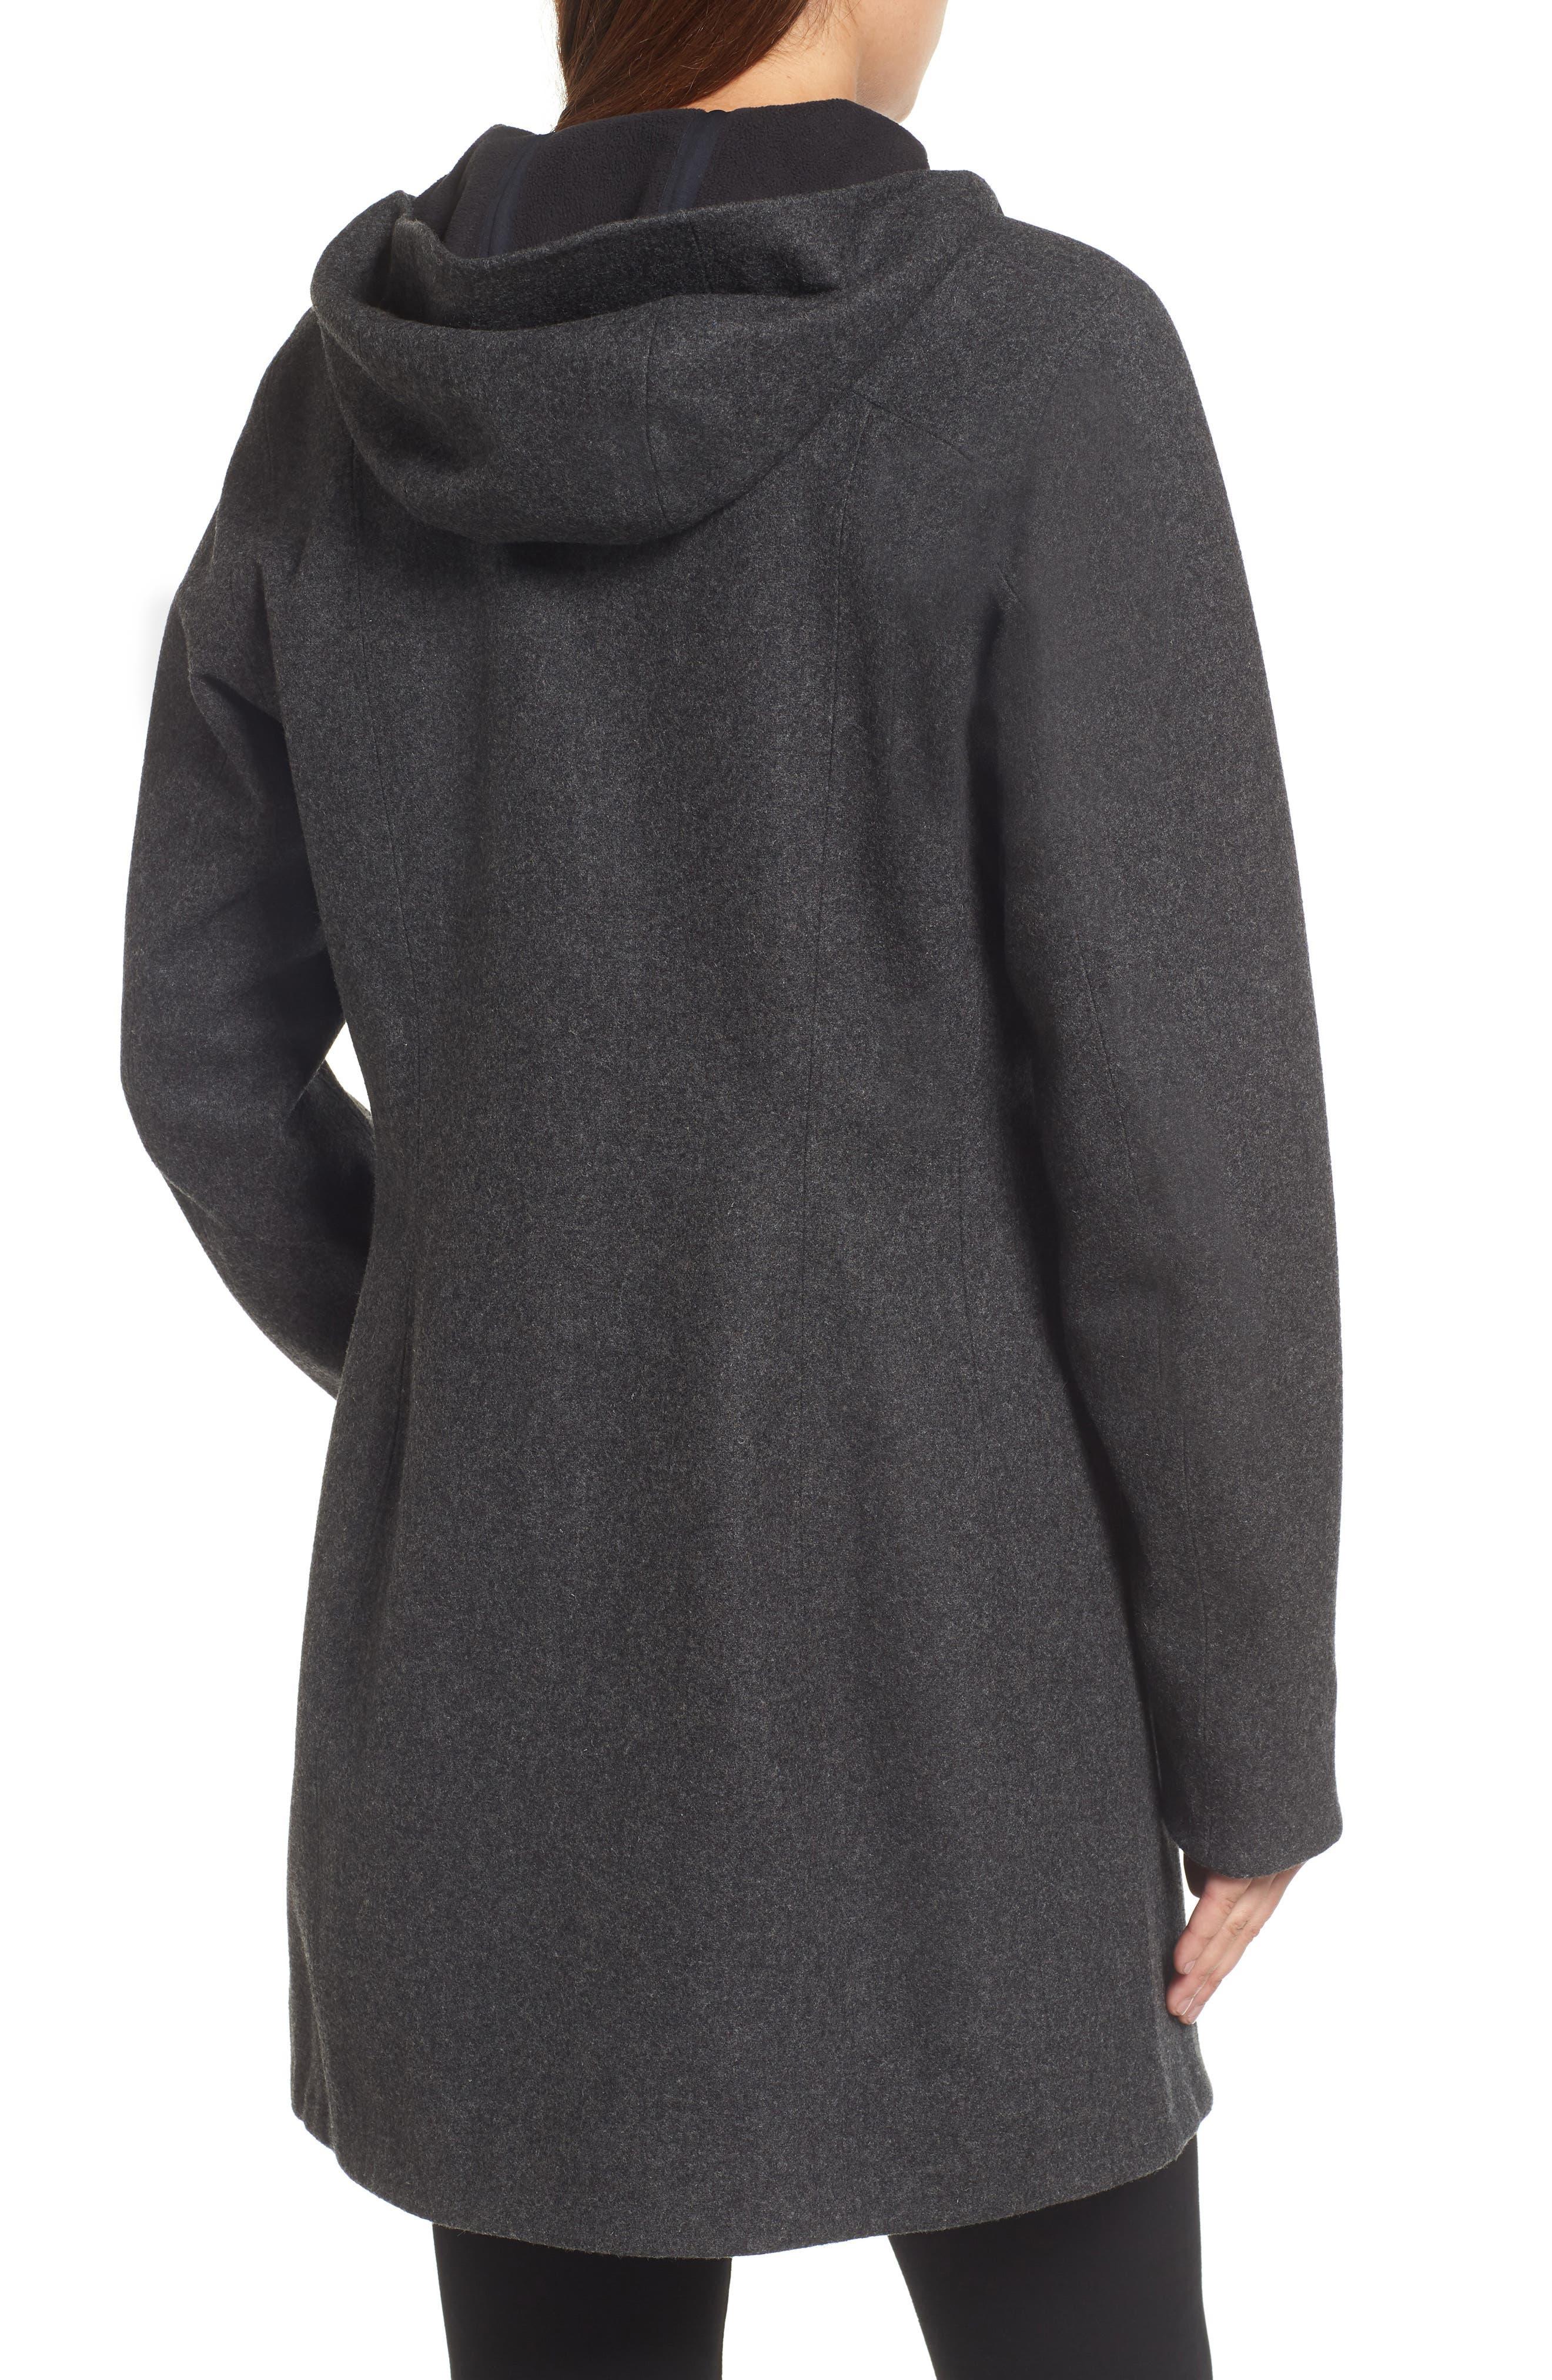 Embra Hooded Walking Coat,                             Alternate thumbnail 2, color,                             001